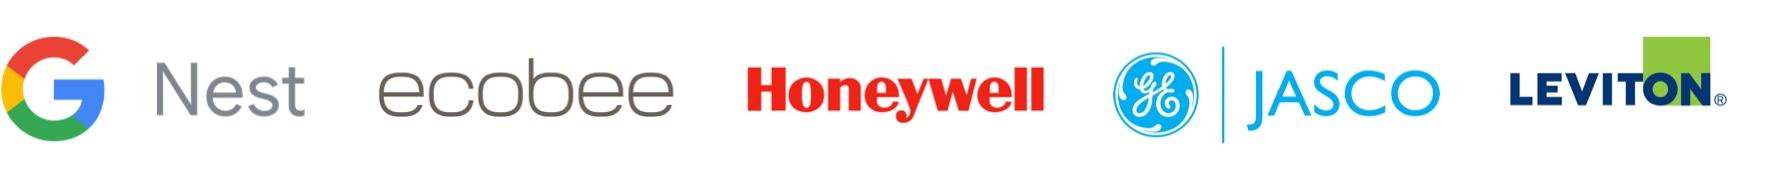 Logos of smart home partners: Google Nest, ecobee, Honeywell, Jasco, and Leviton.